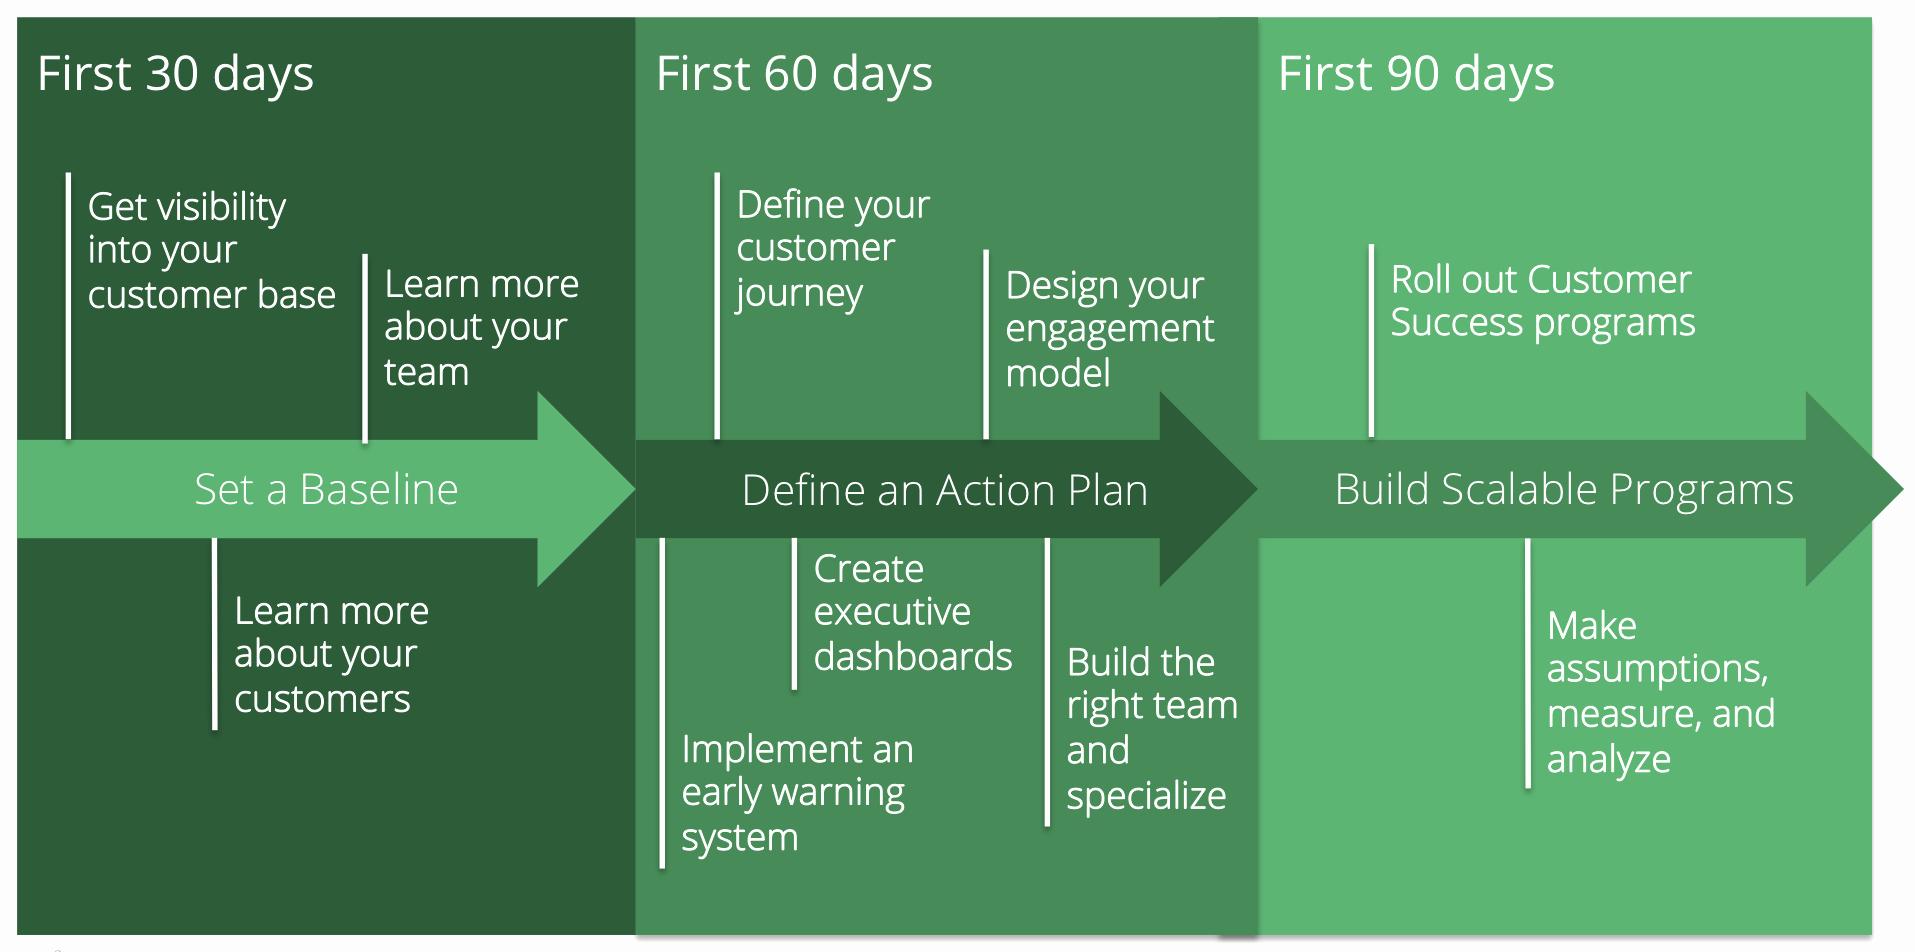 First 90 Days Plan Template Beautiful Your 90 Day Customer Success Plan